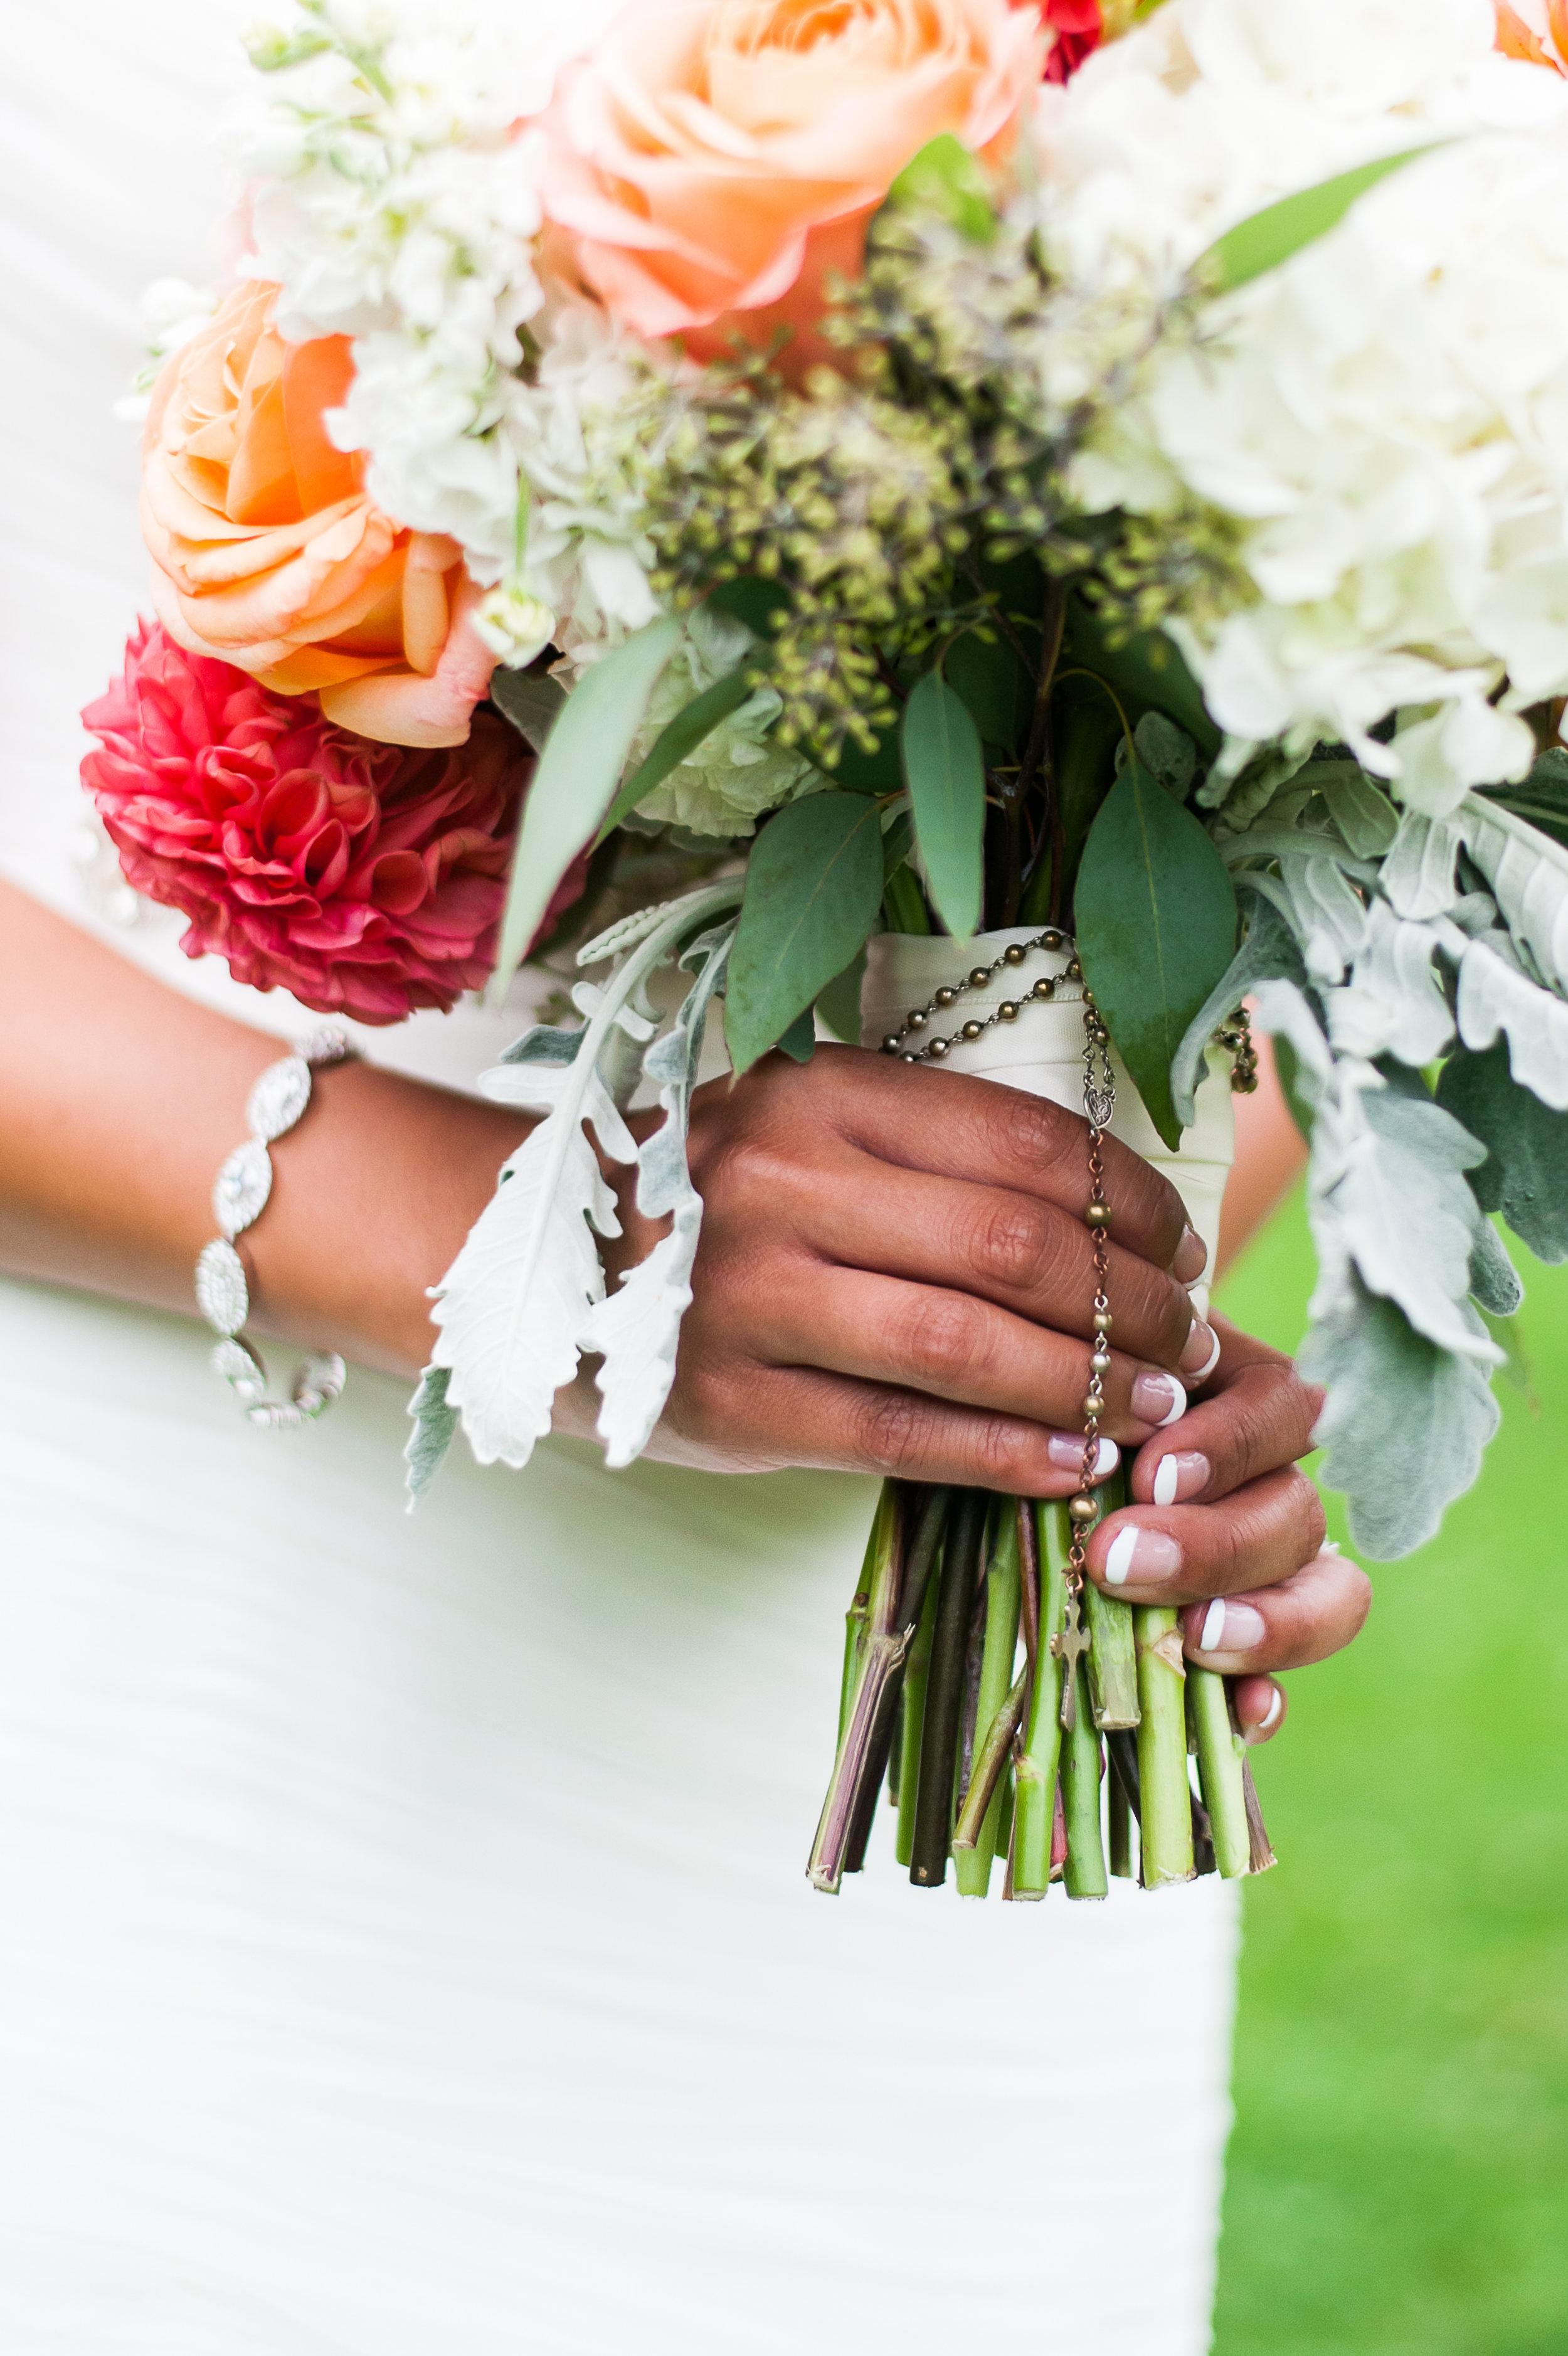 DJ-wedding-Van-Wyhe-Photography-249.jpg